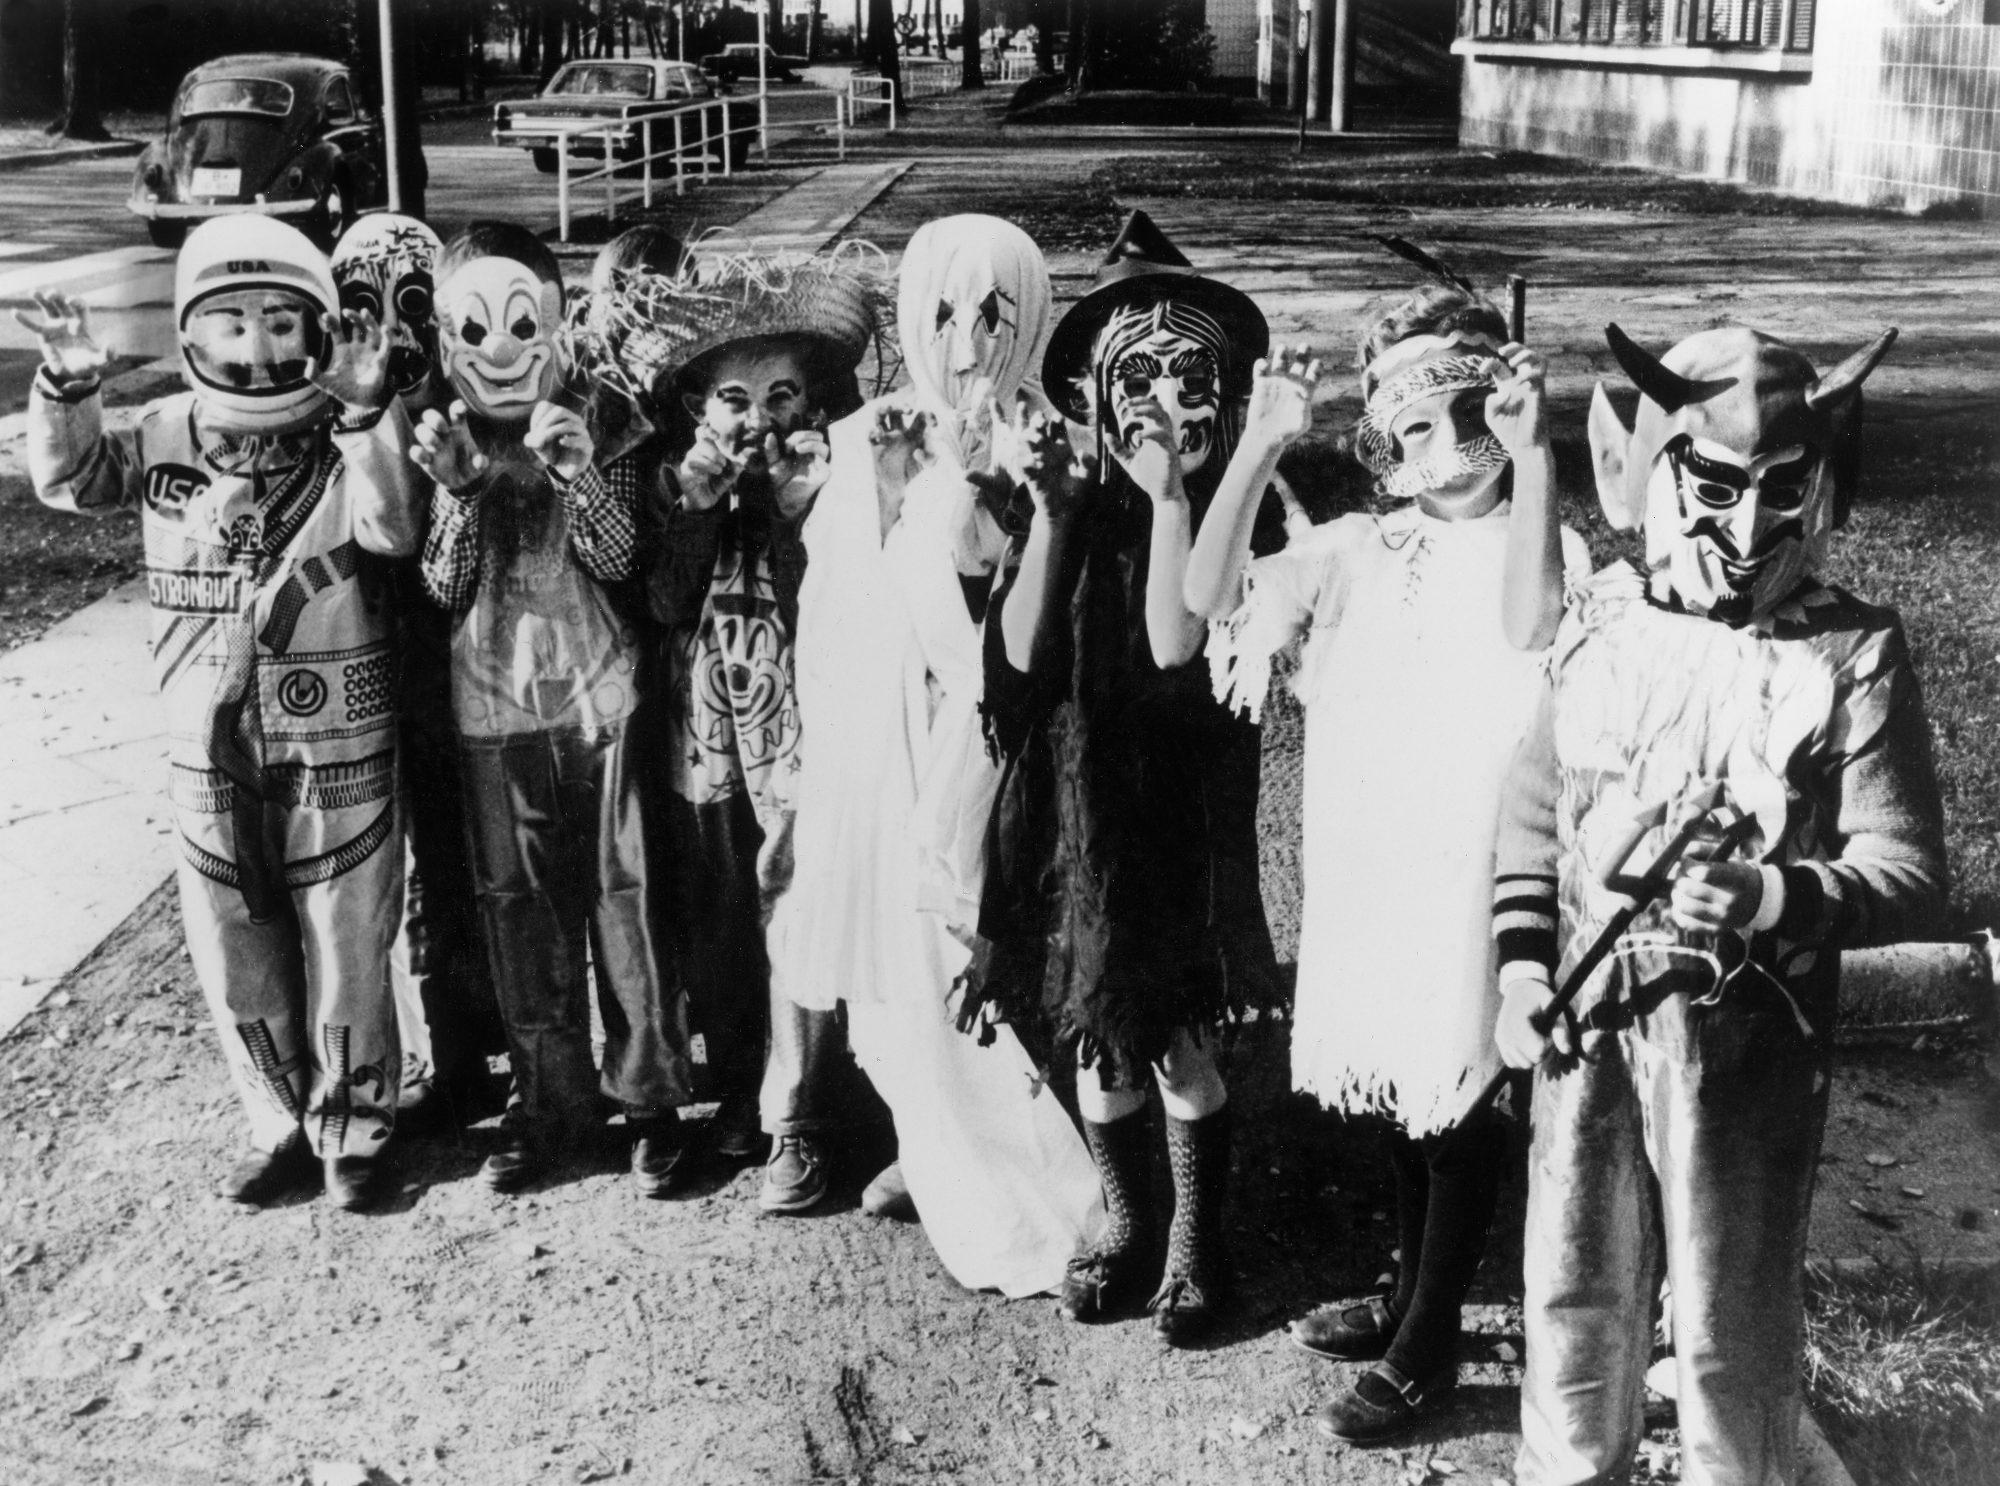 Vintage photo of kids dressed in Halloween costumes